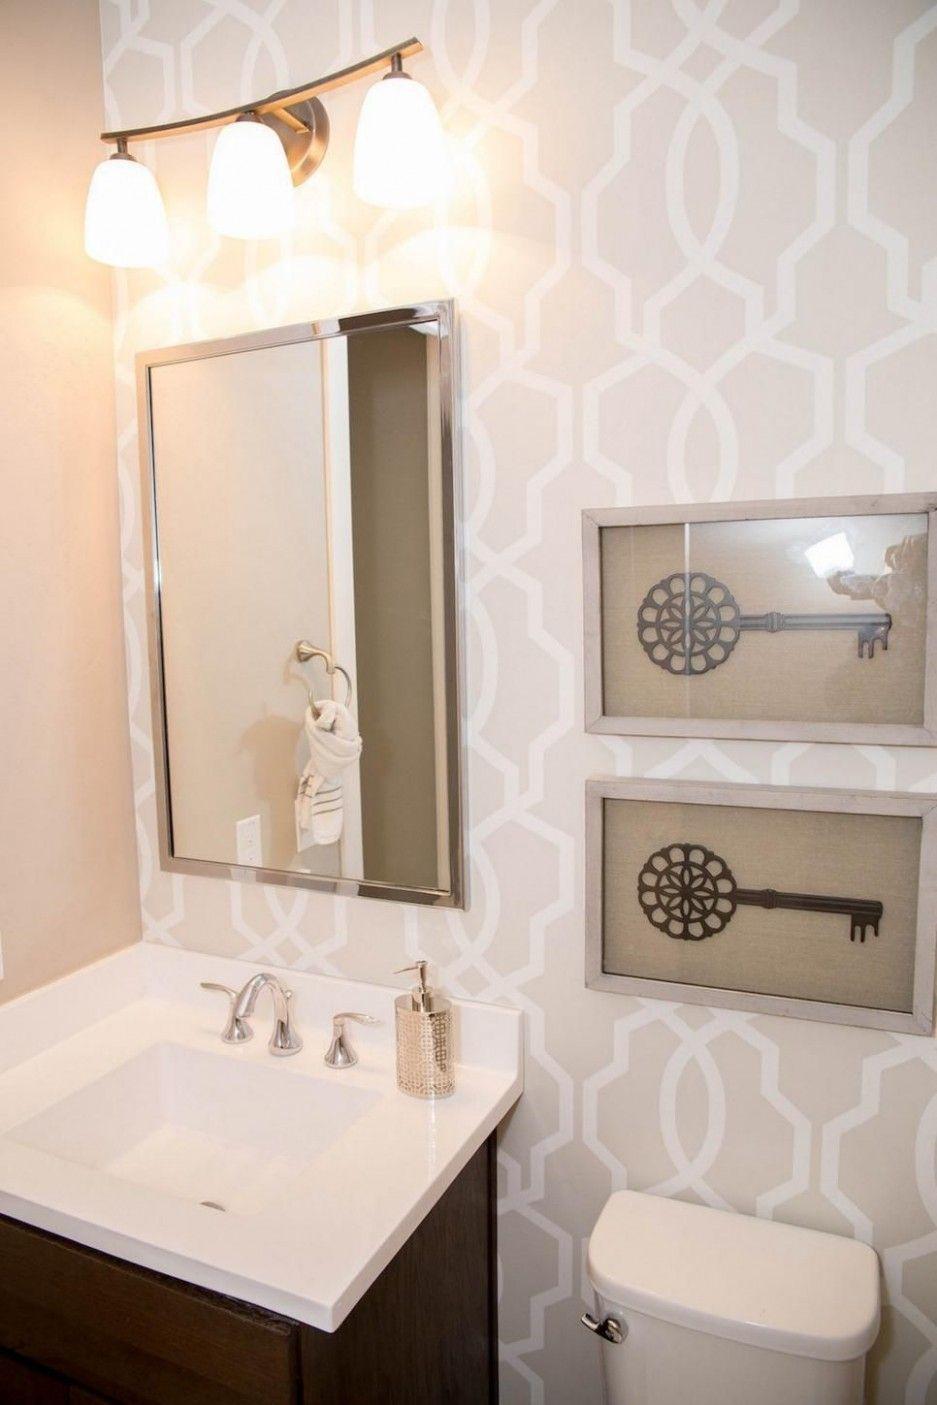 Modern Wallpaper Ideas For Small Bathroom Trends In 2020 Small Bathroom Trends Small Bathroom Remodel Bathroom Trends